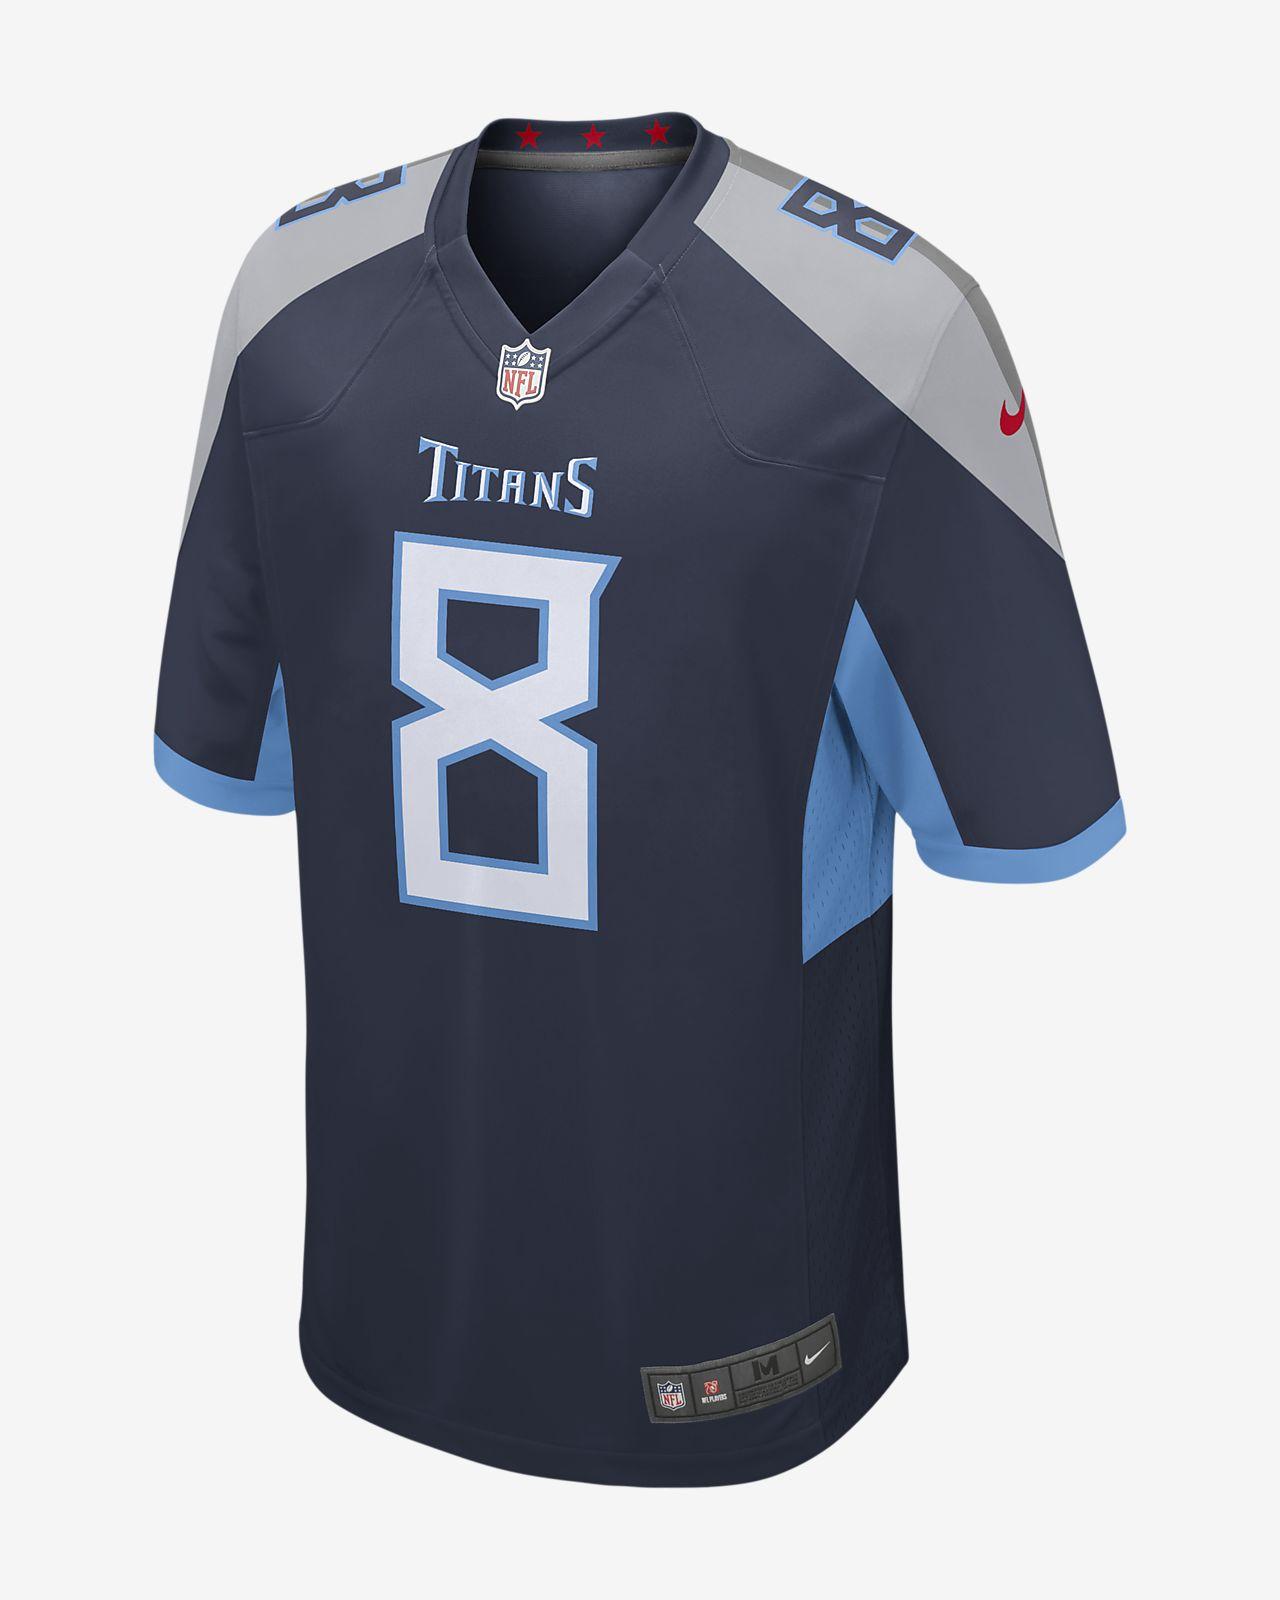 Maillot de football américain NFL Tennessee Titans Game (Marcus Mariota) pour Homme